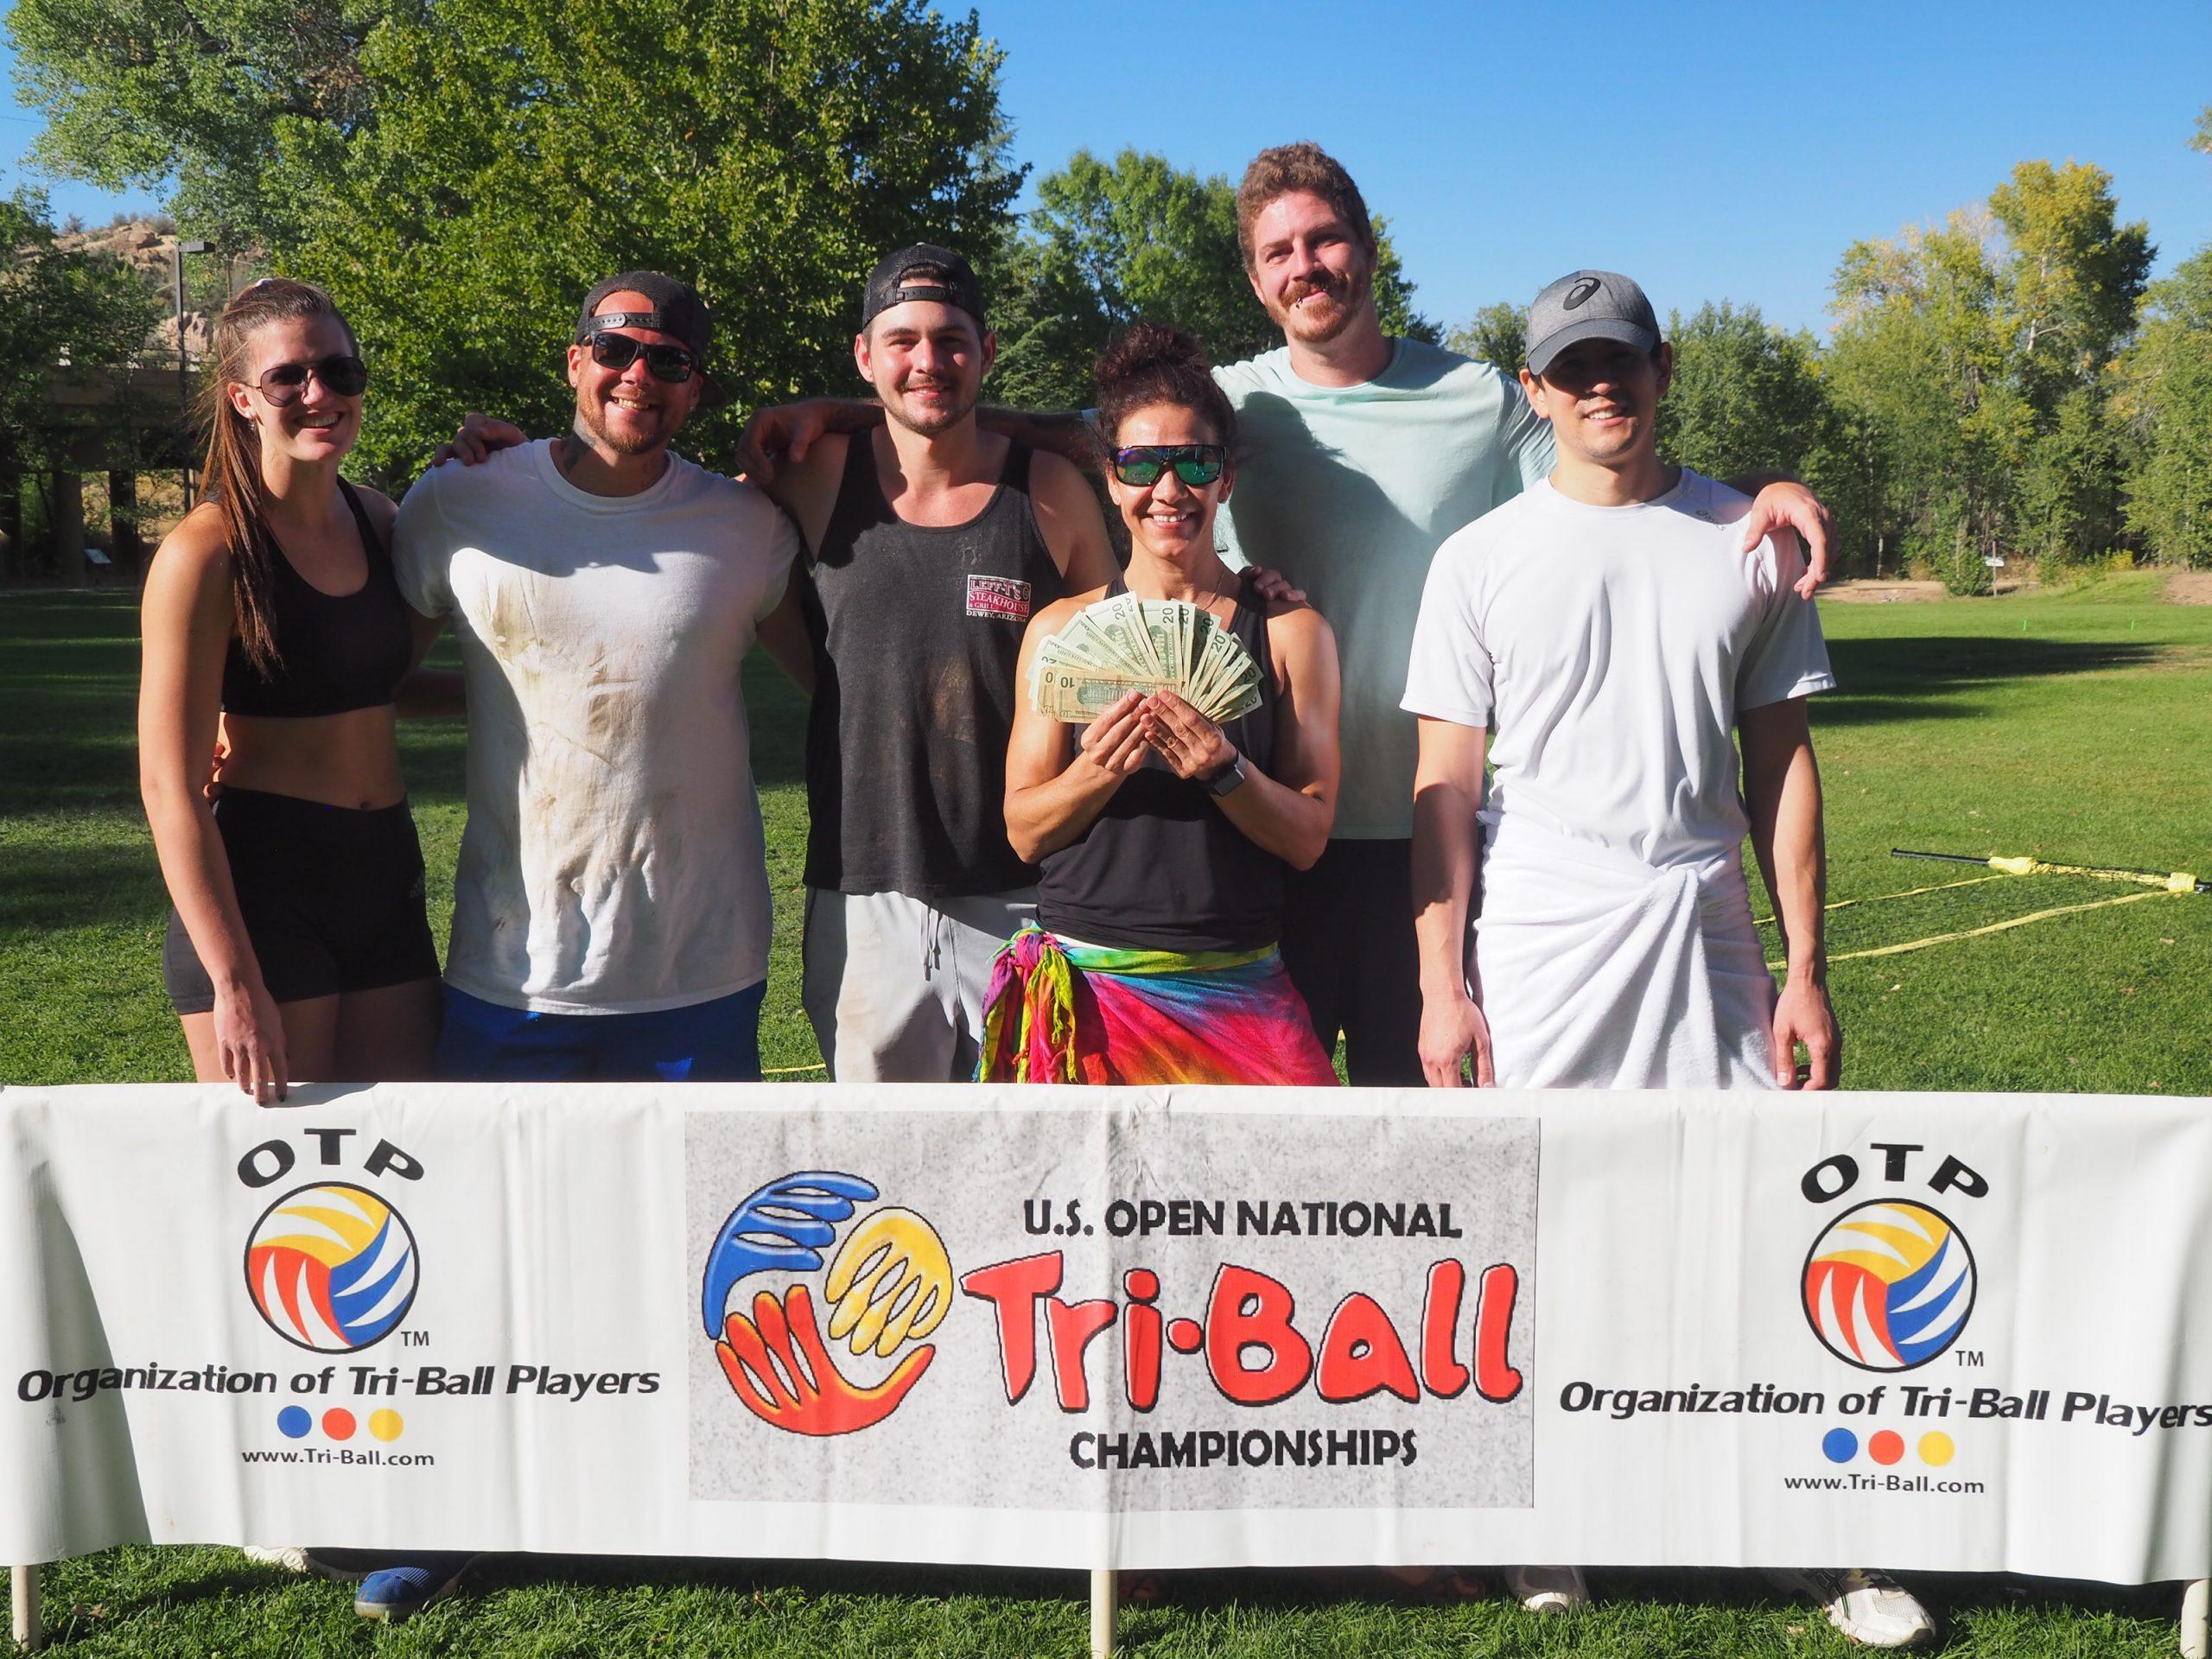 Sun June 13 Midwest Tri-Ball Regionals tournament